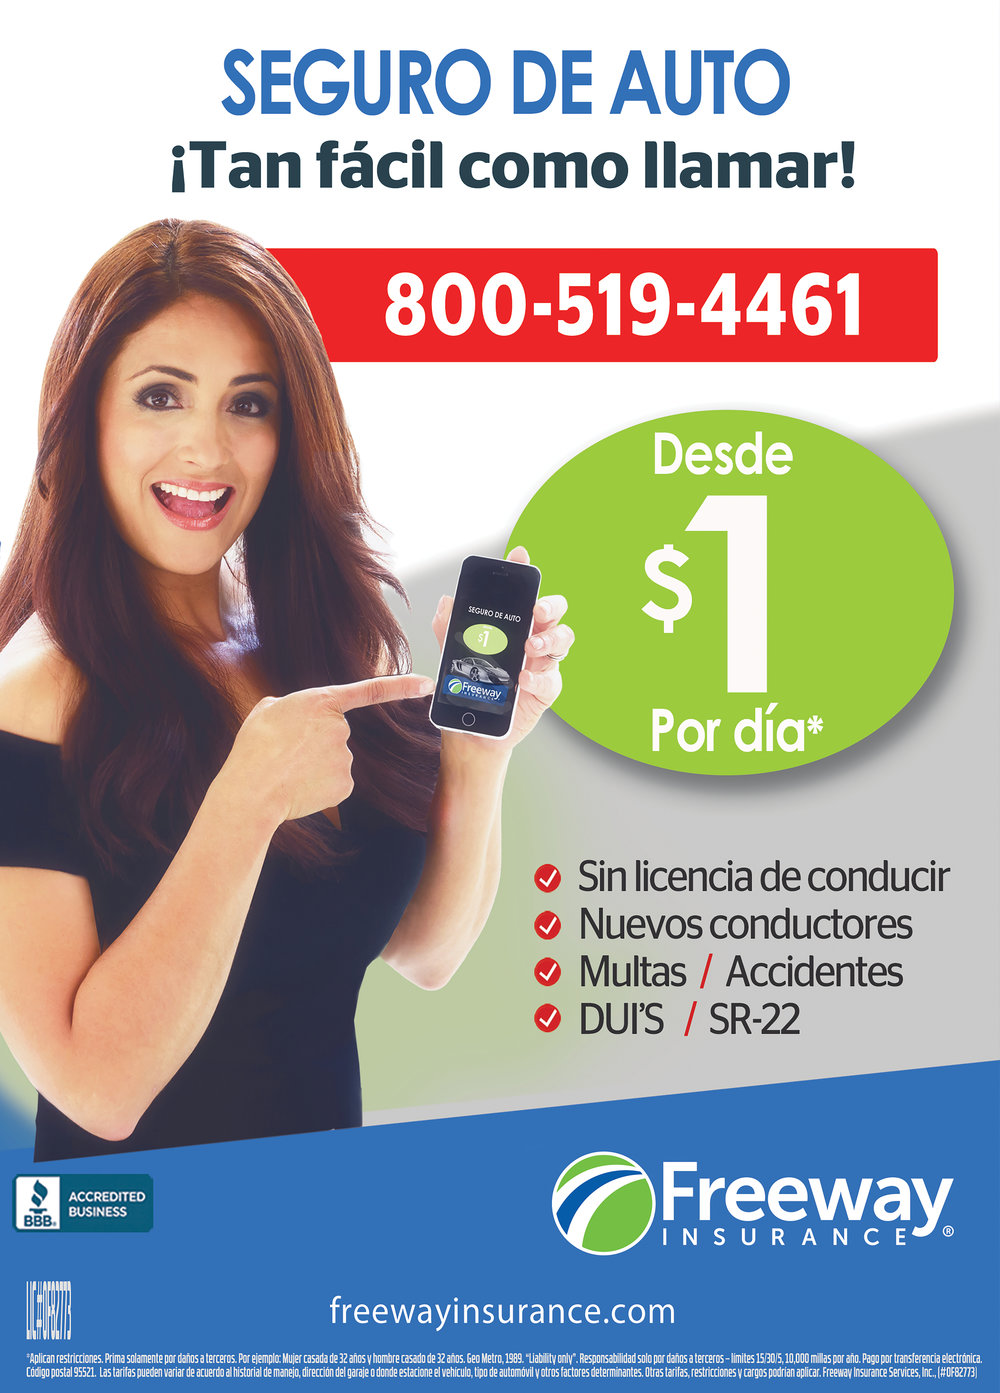 freeway Insurance - 1 Pag OCTUBRE 2018.jpg